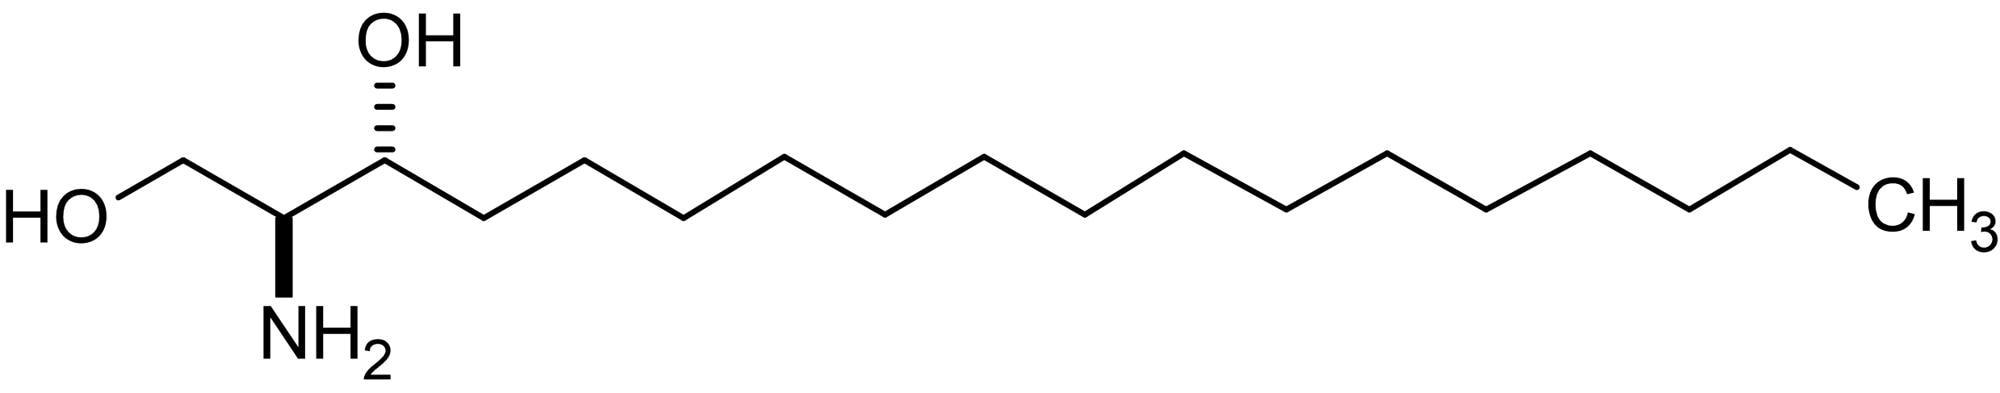 Chemical Structure - D,L-erythro-Dihydrosphingosine, sphingosine kinase inhibitor, PKC inhibitor (ab143936)